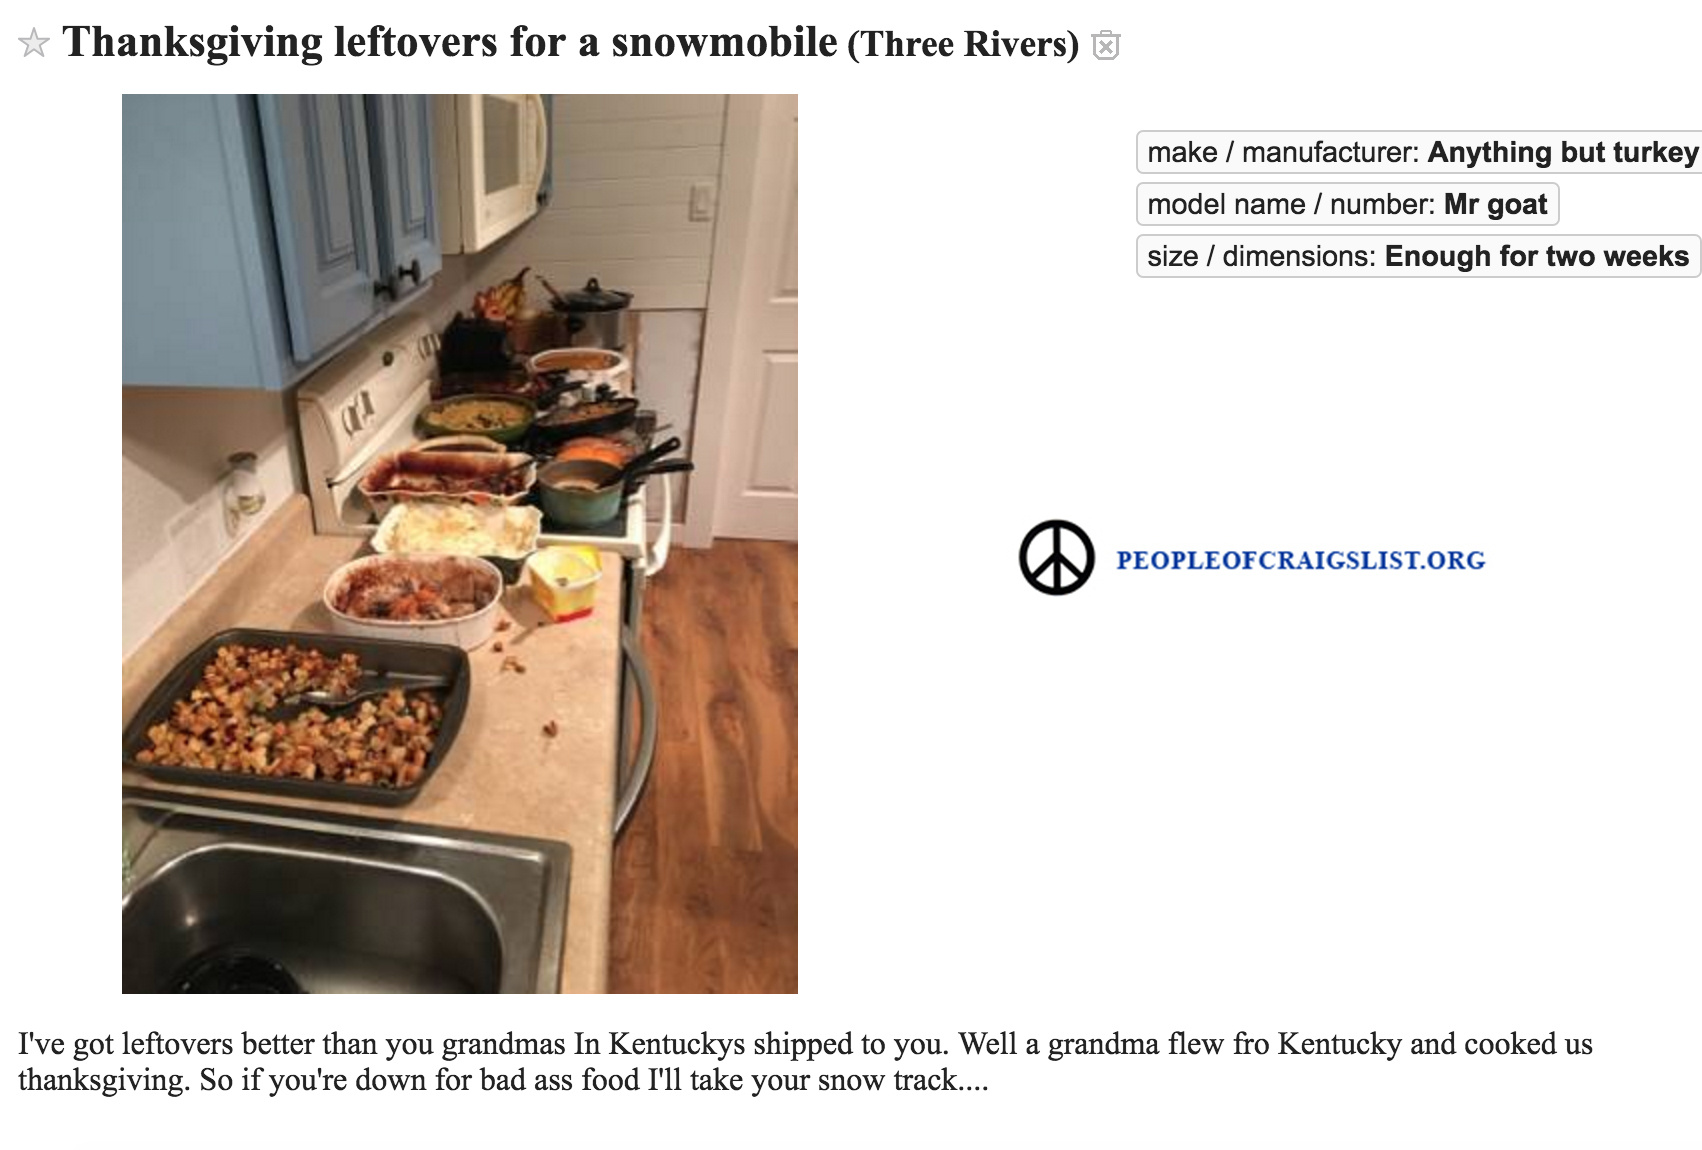 craigslist thanksgiving leftovers